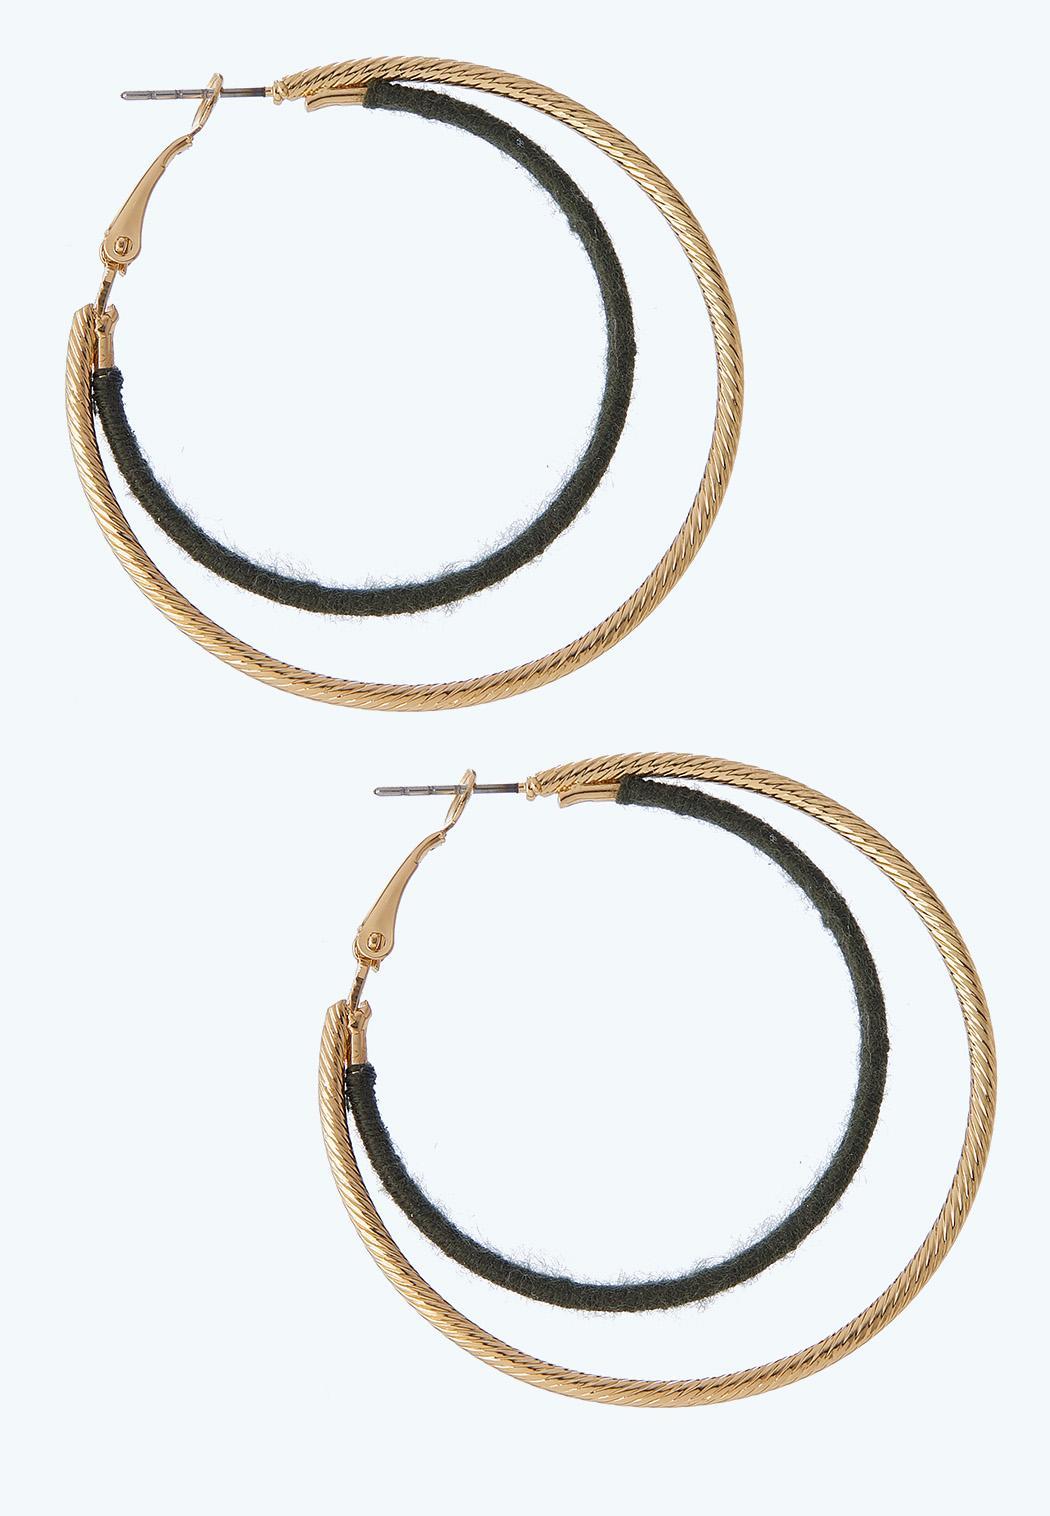 Two-Toned Wrapped Hoop Earrings